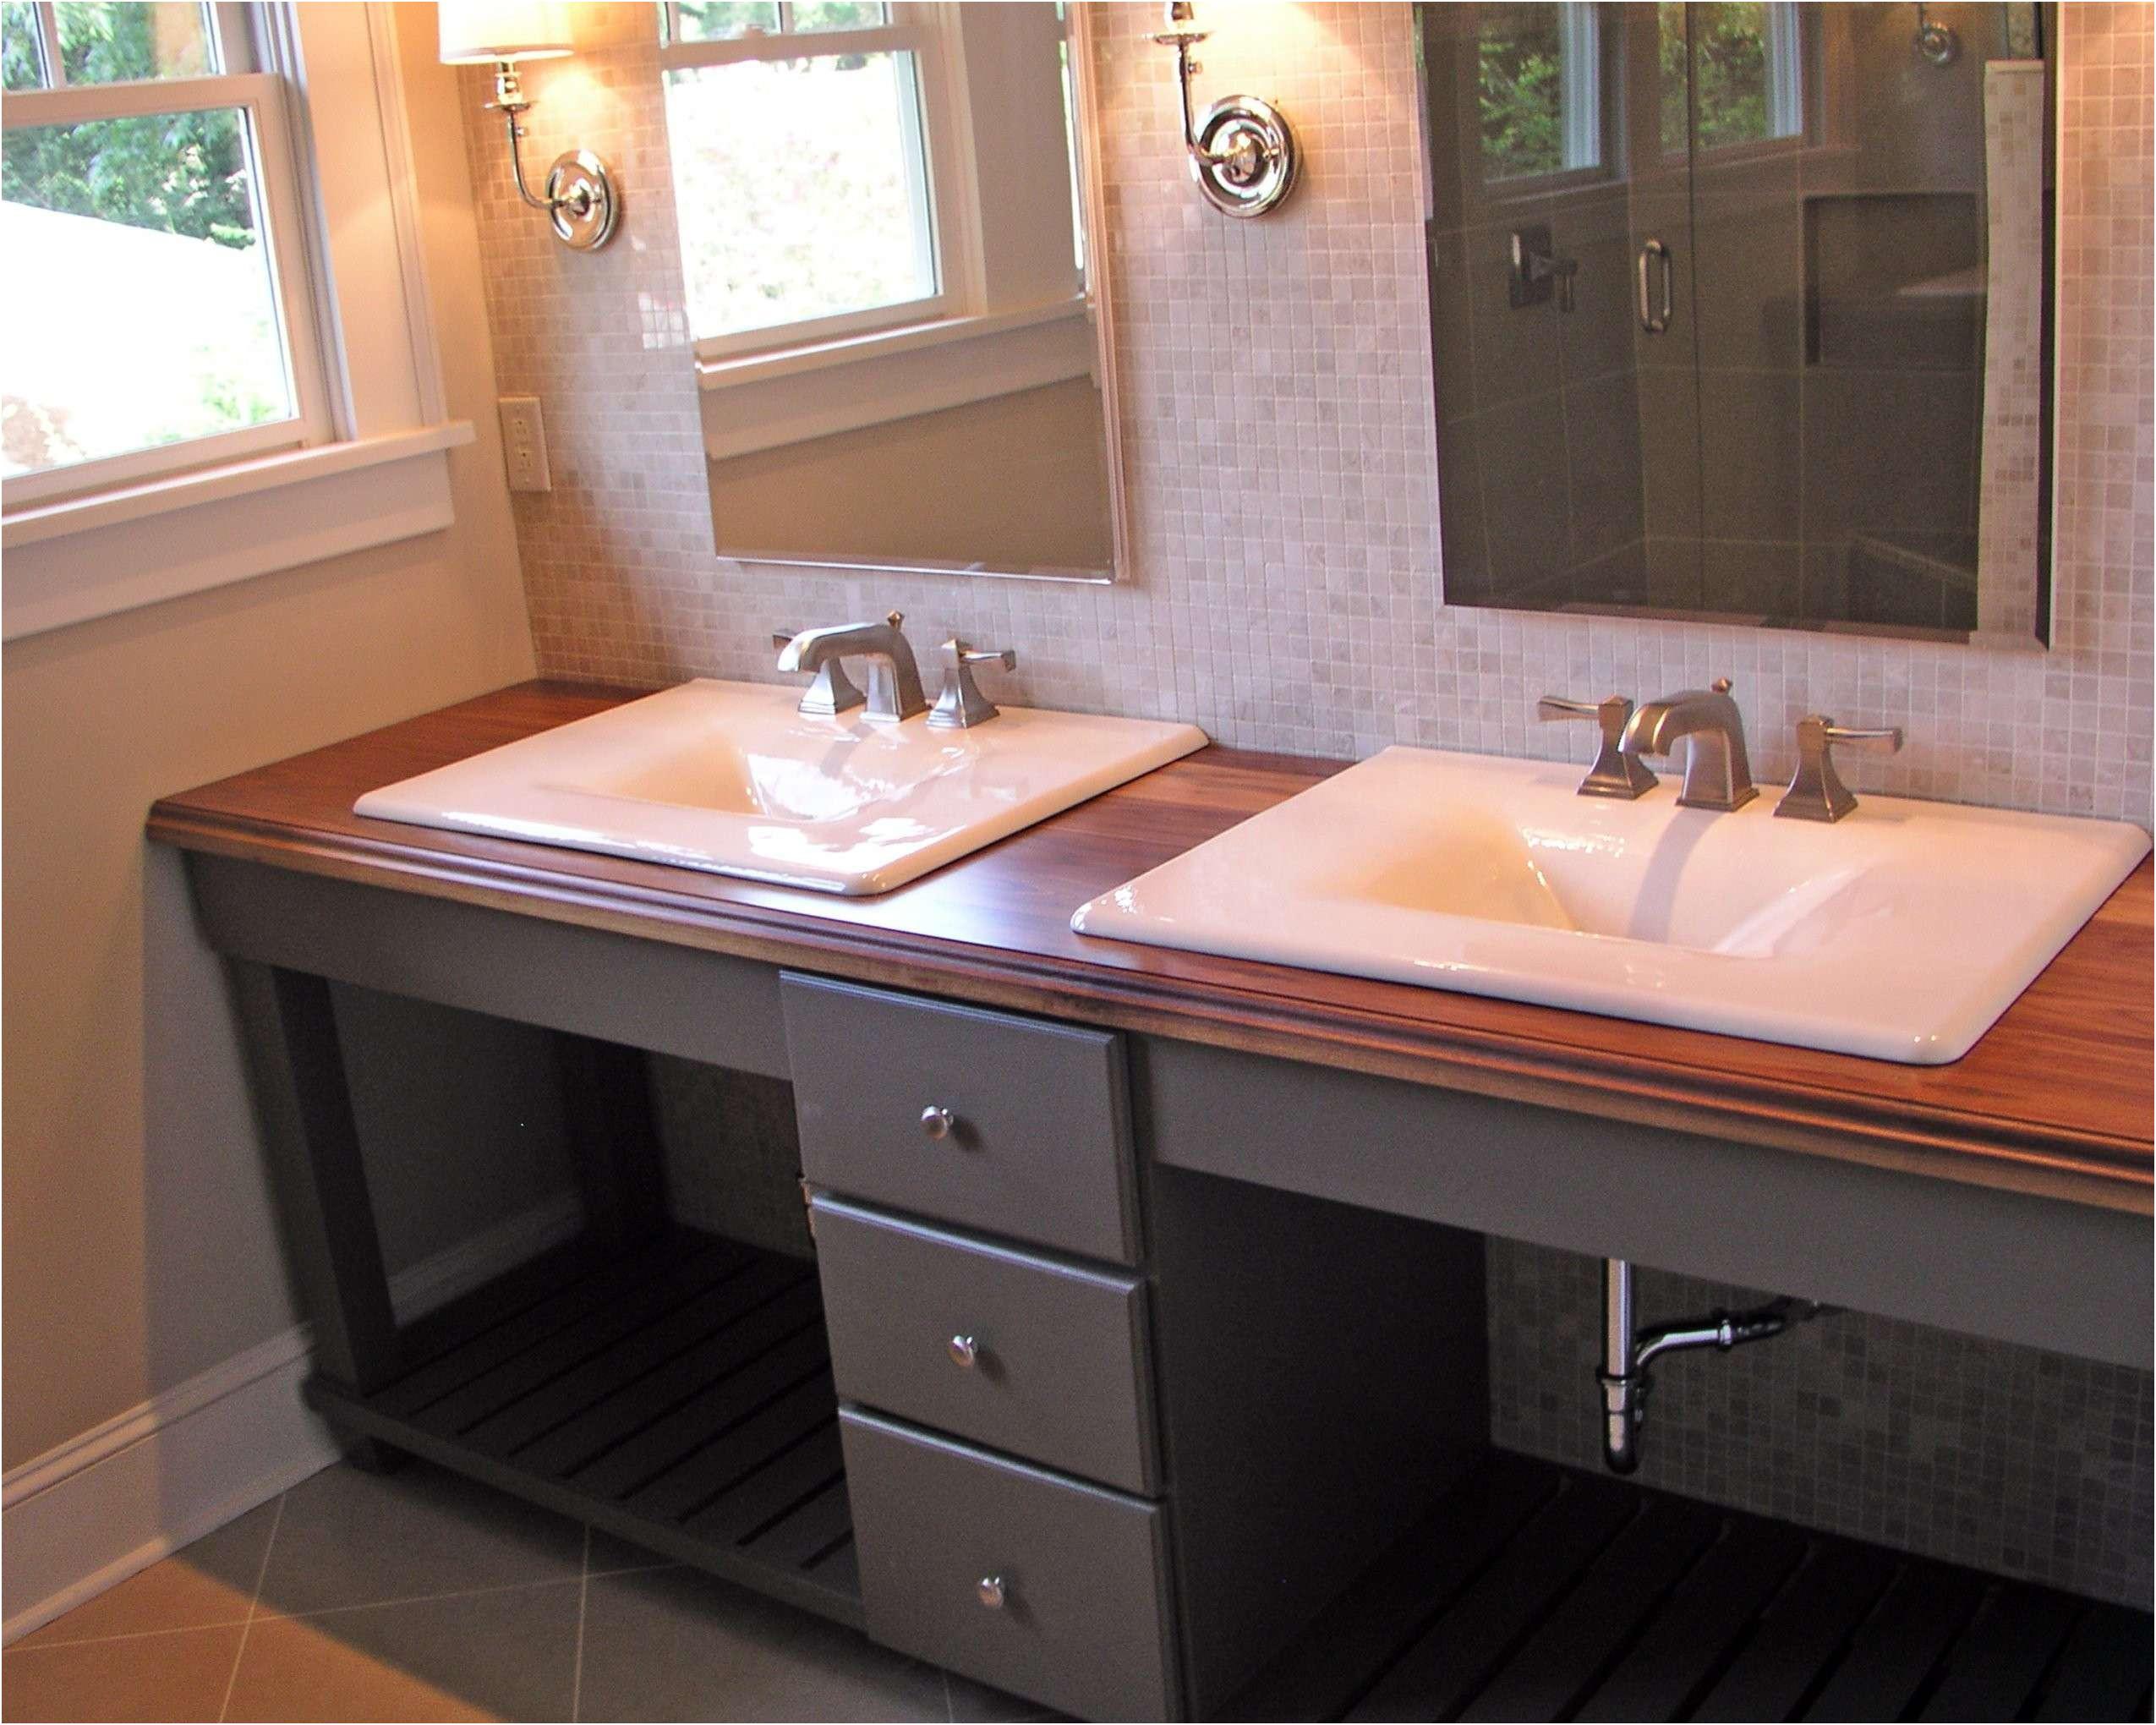 Inspirational Sink Bowls for Bathrooms